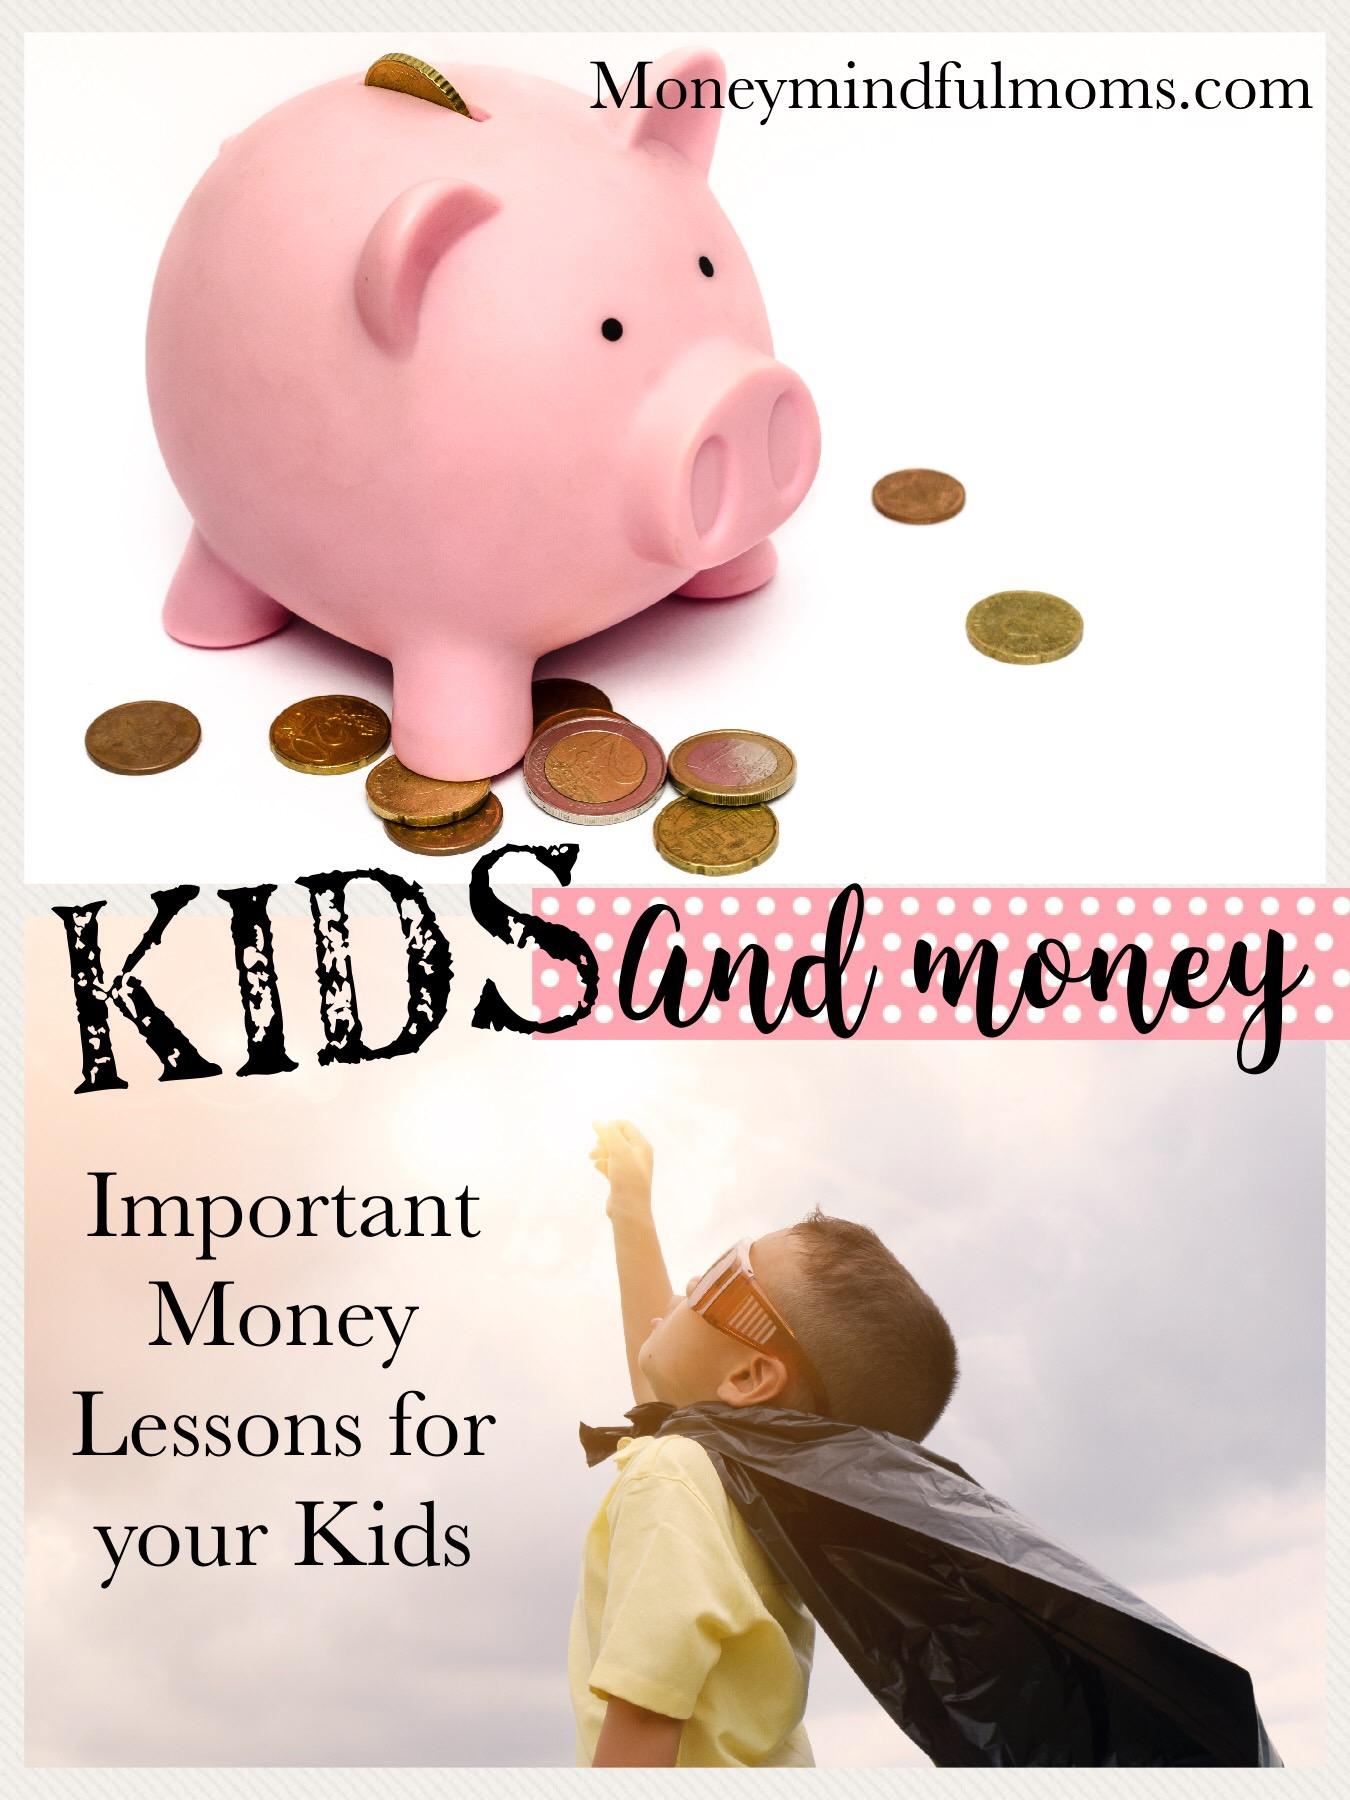 Teaching your kids good money habits